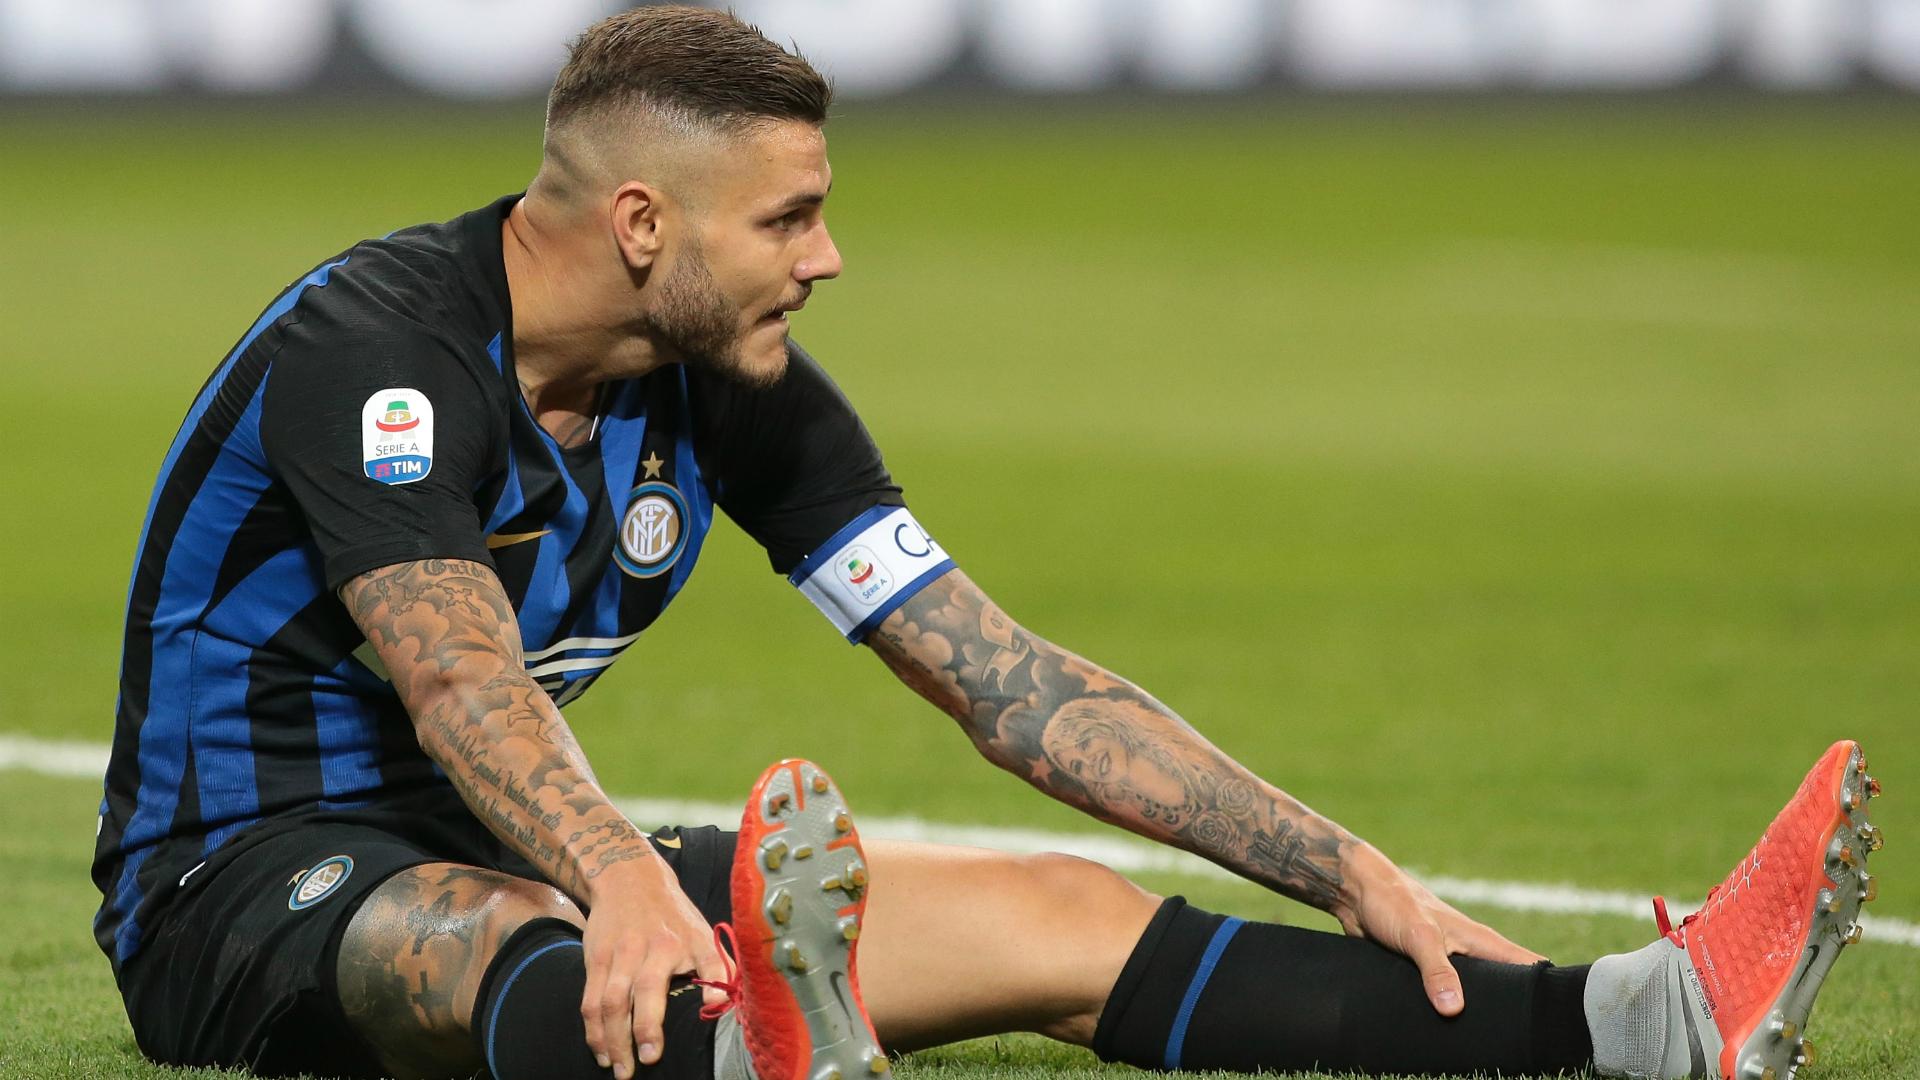 Icardi should respect his team-mates, says AC Milan boss Gattuso